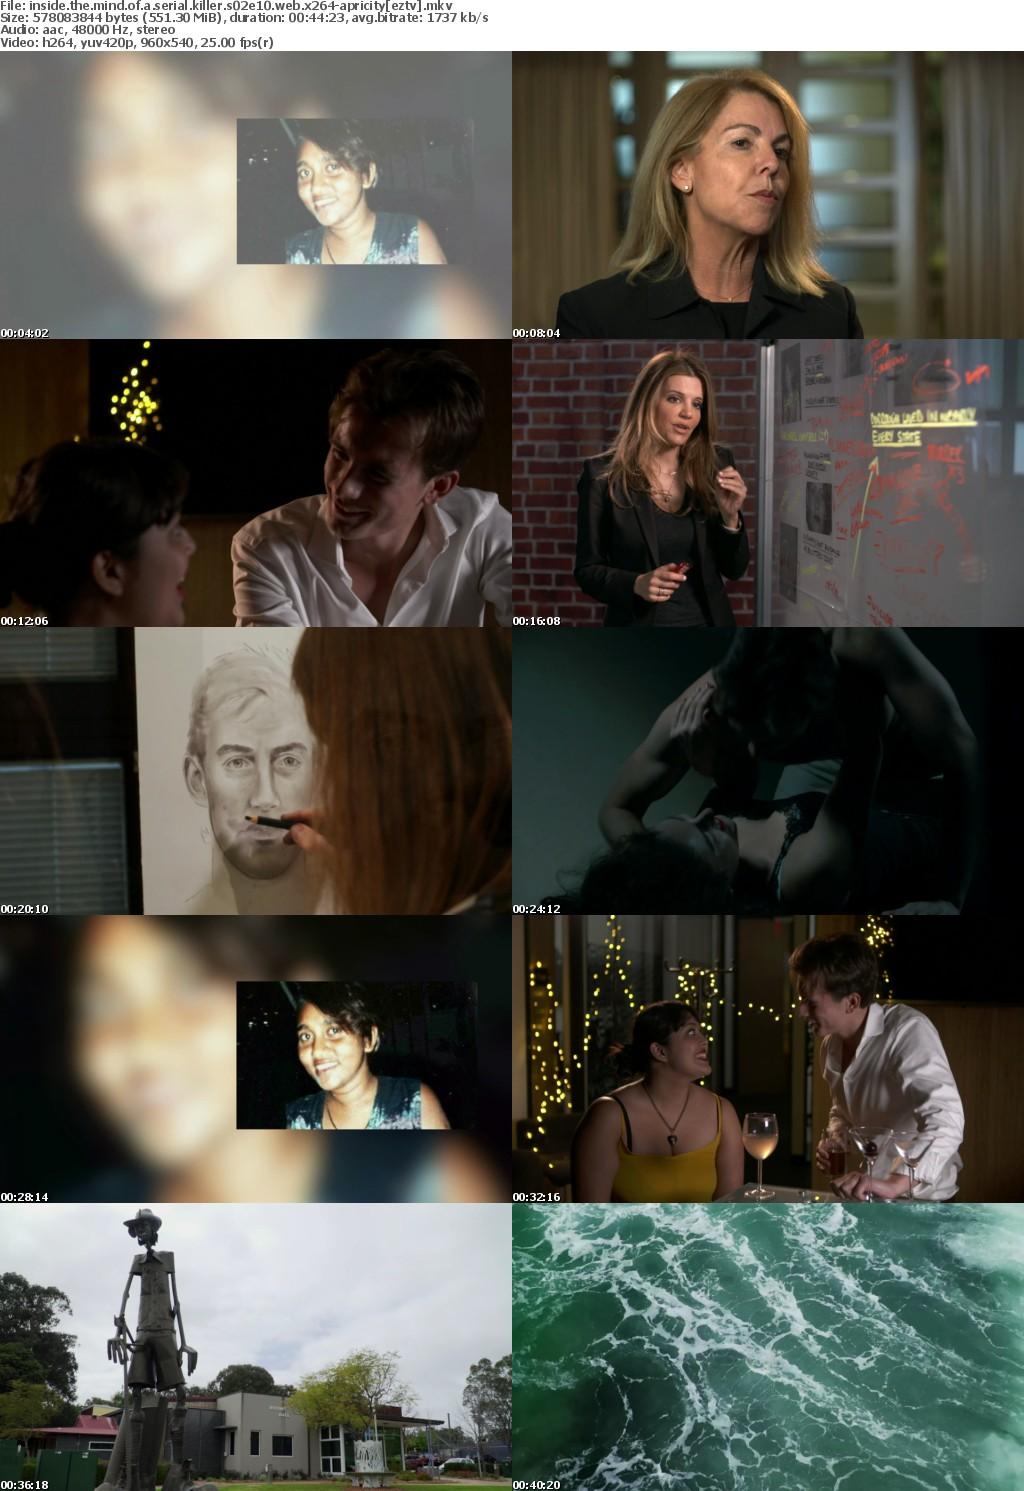 Inside the Mind of a Serial Killer S02E10 WEB x264-APRiCiTY